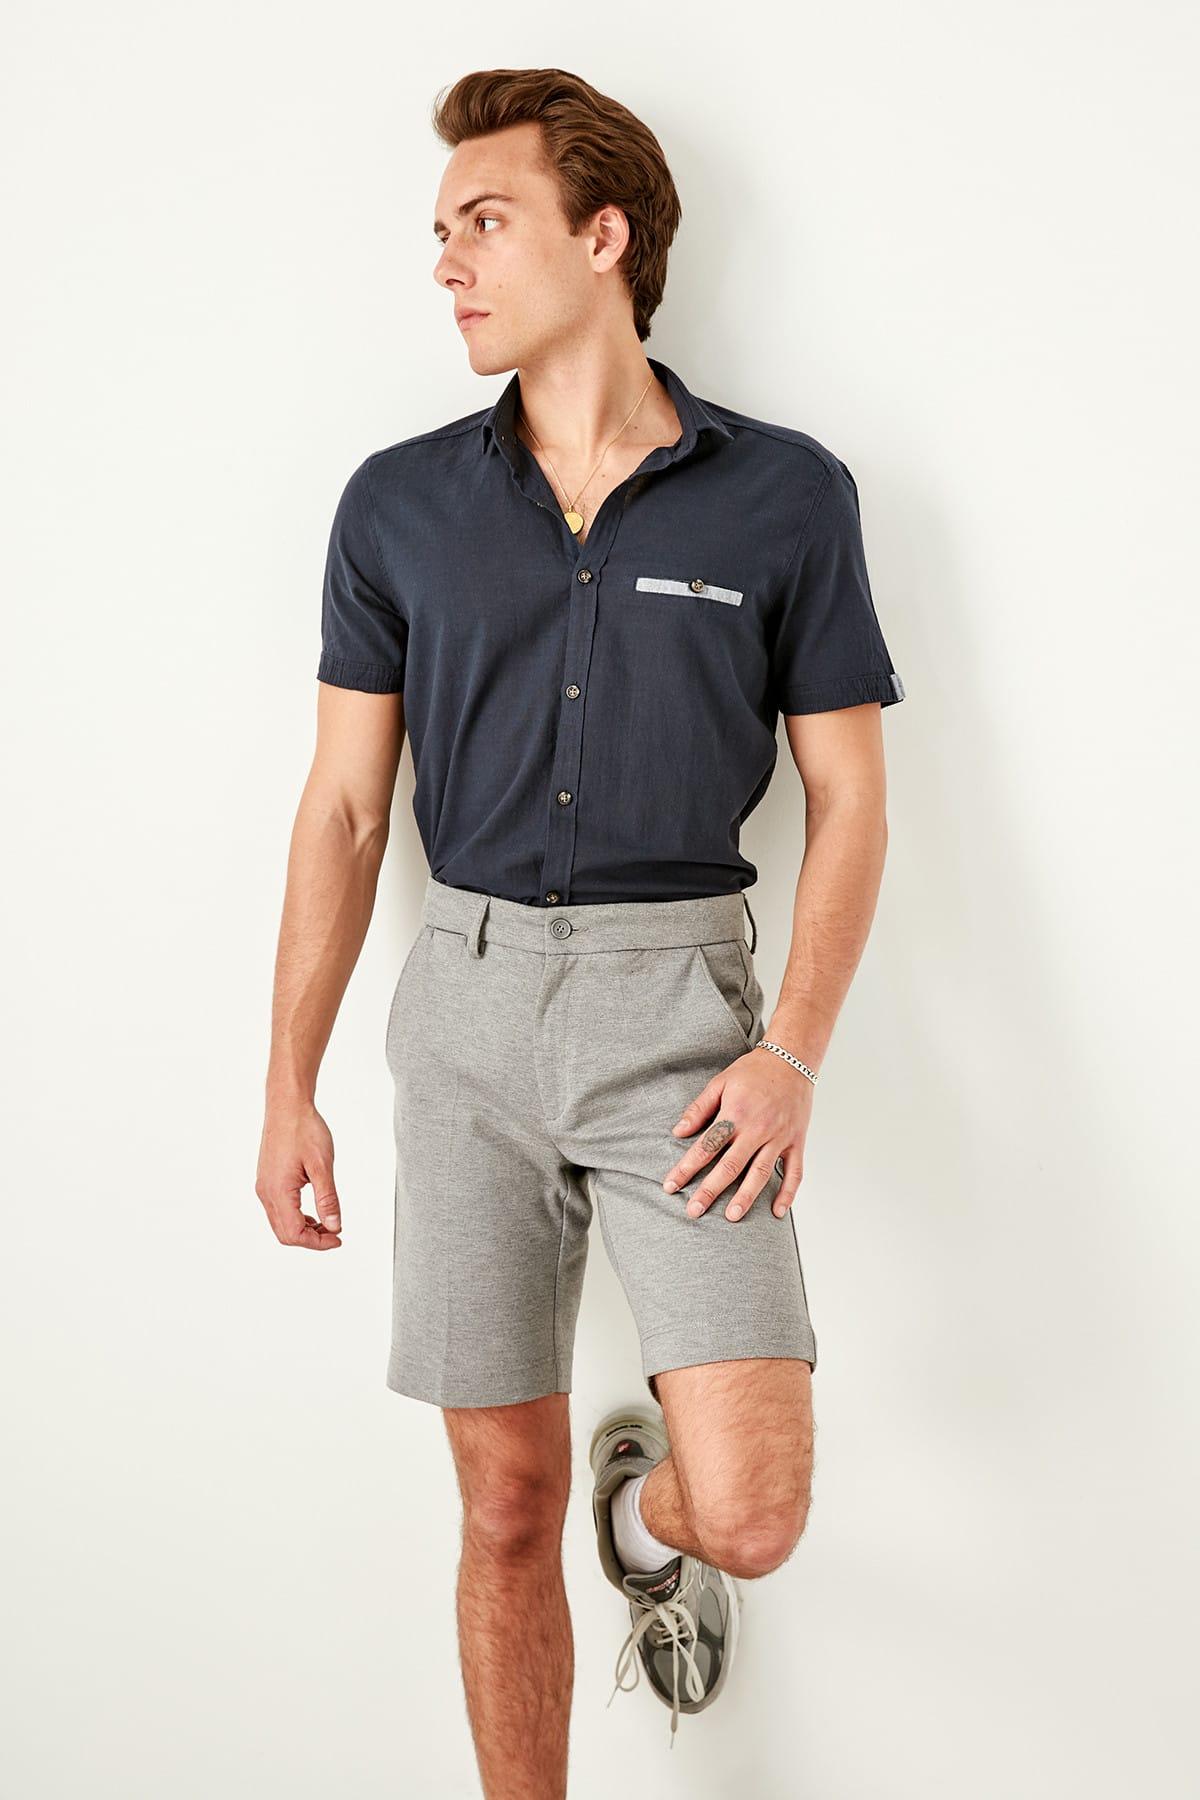 Trendyol Navy Blue Short Sleeve Slim Fit Shirts Buttoned Collar Epaulets Men